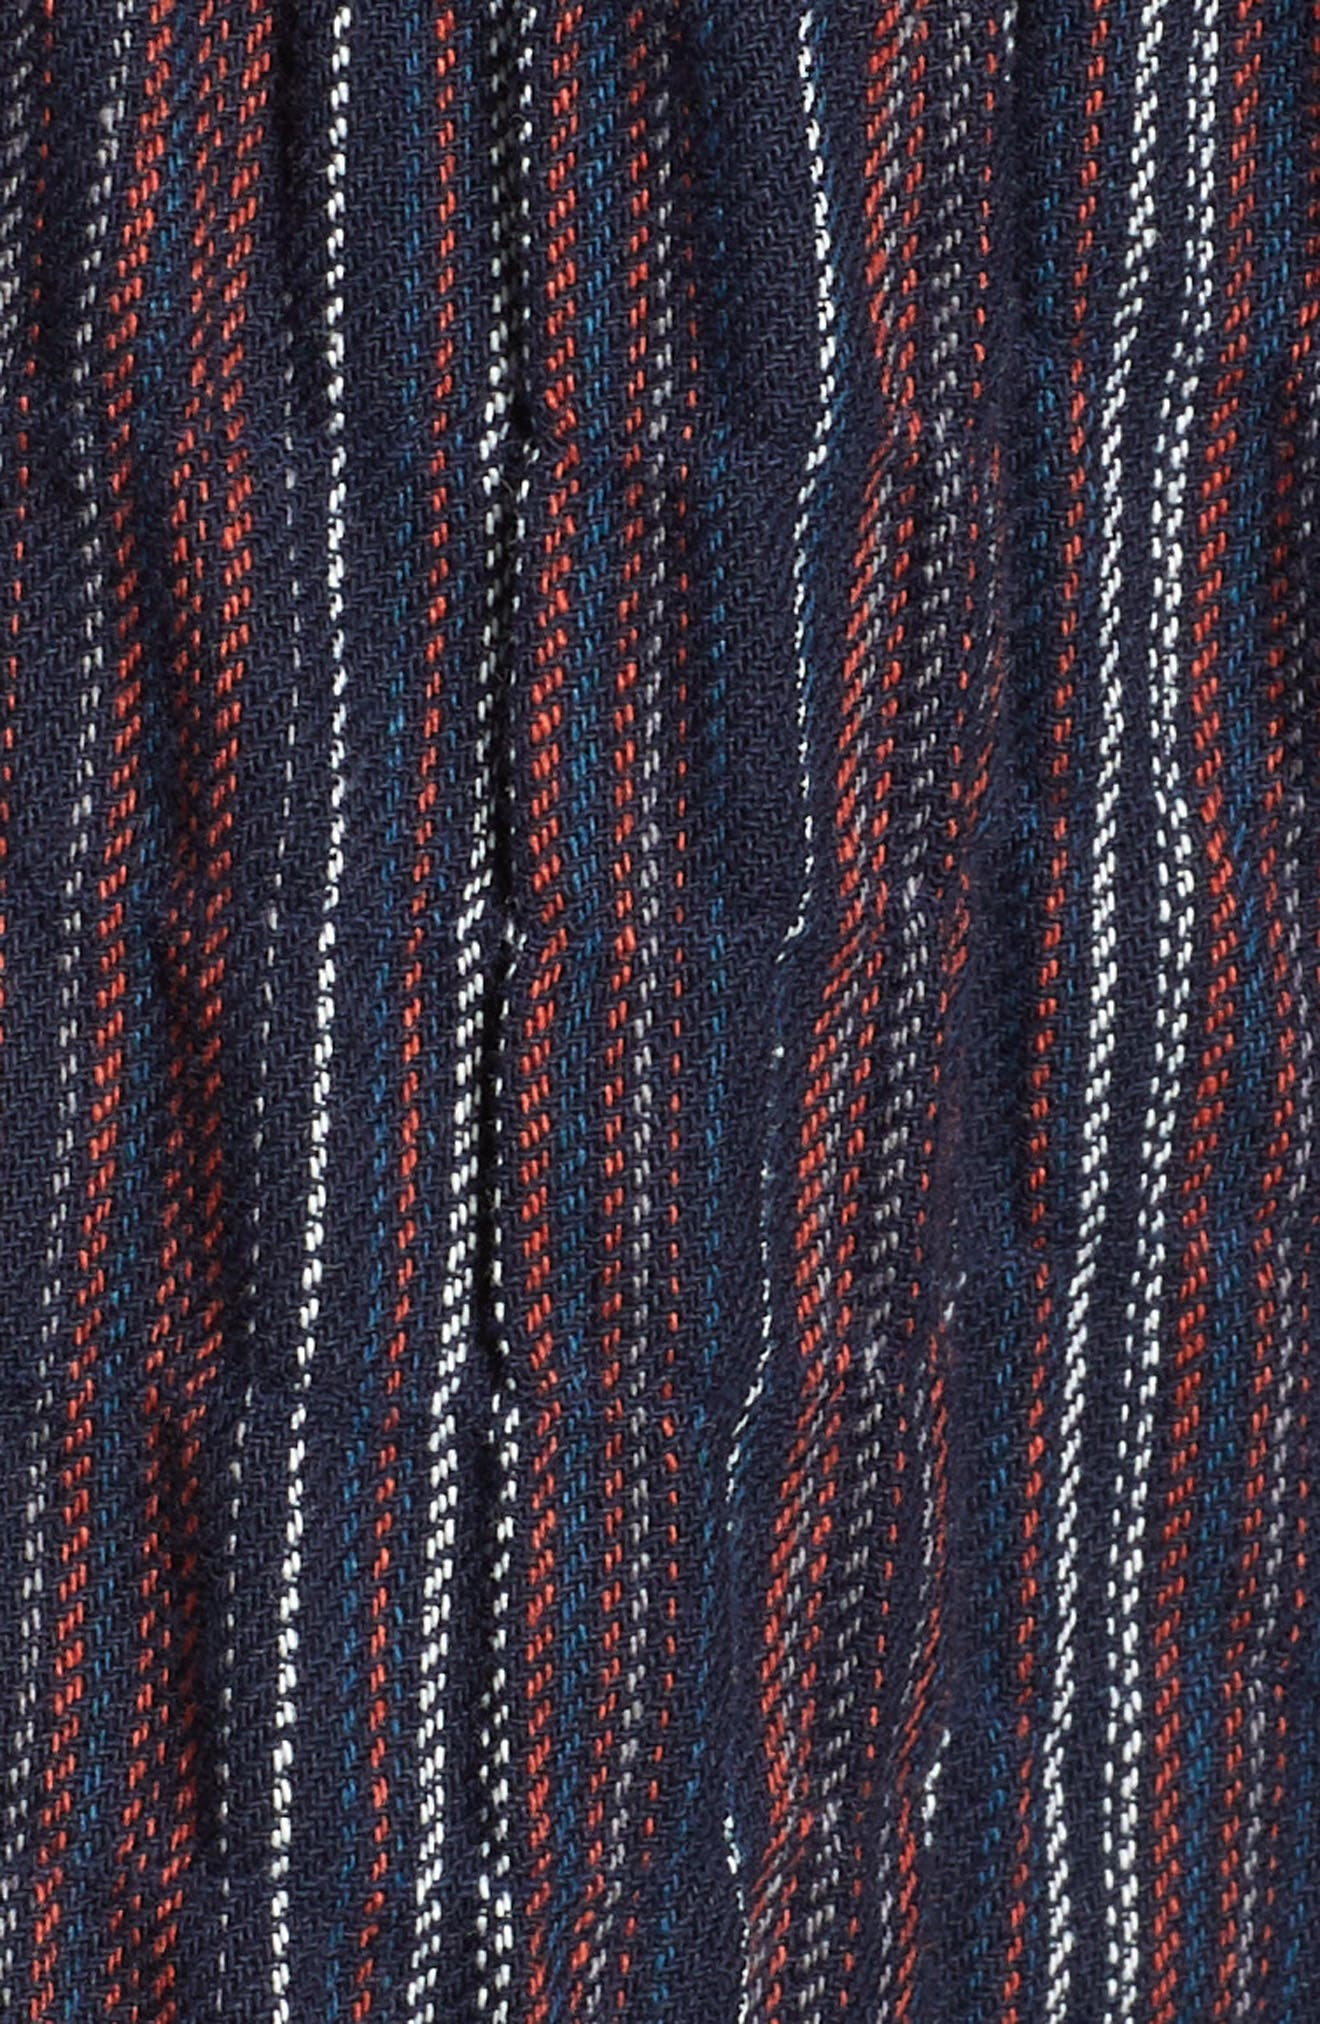 Stripe Off the Shoulder Dress,                             Alternate thumbnail 6, color,                             411